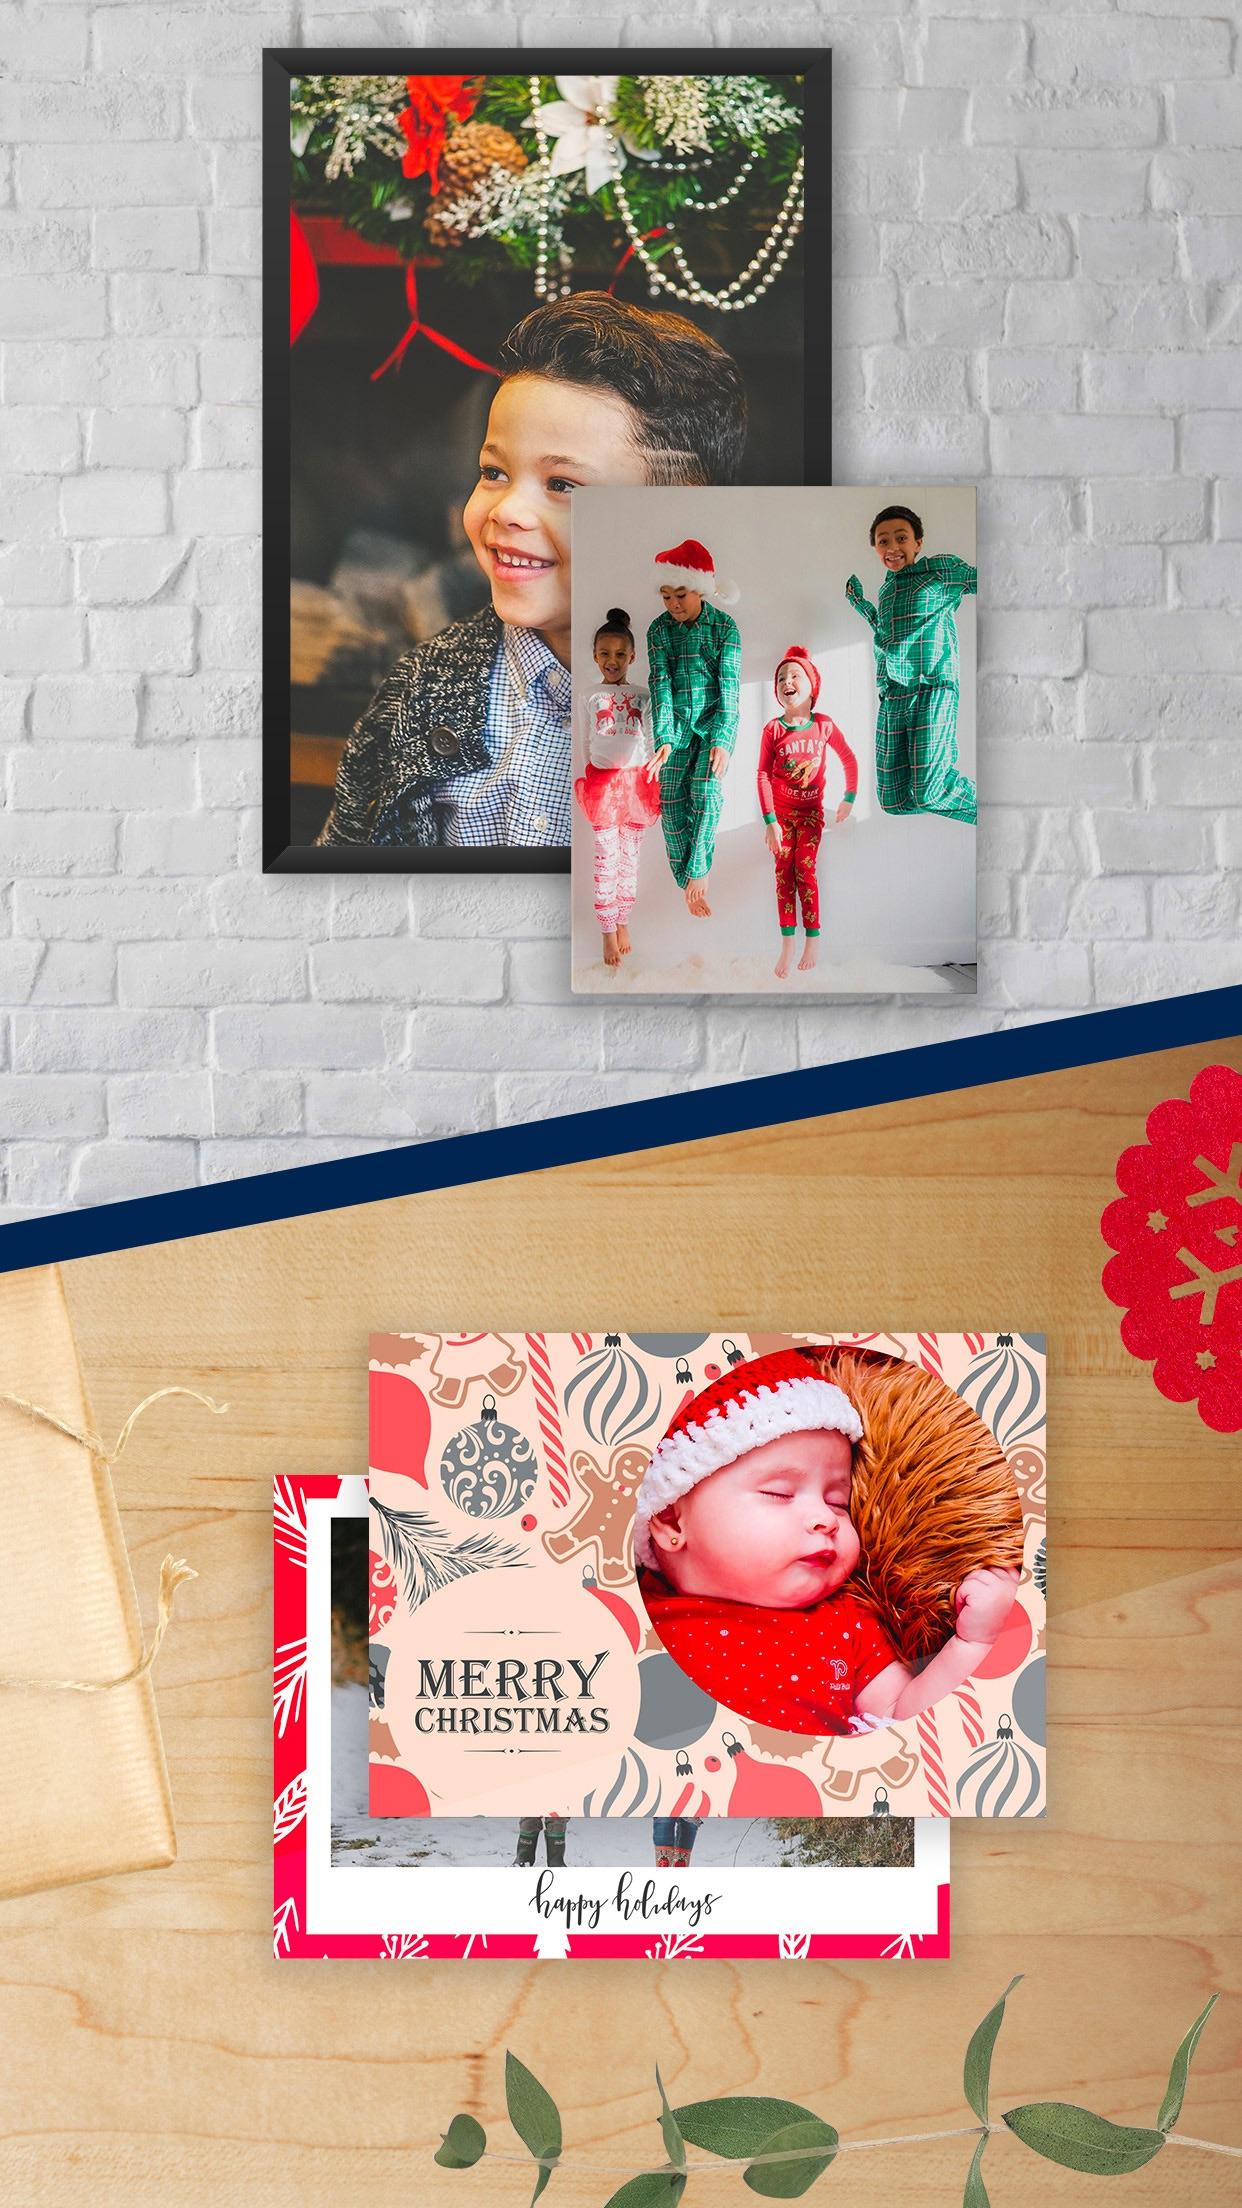 Print Photo - photo print app Screenshot